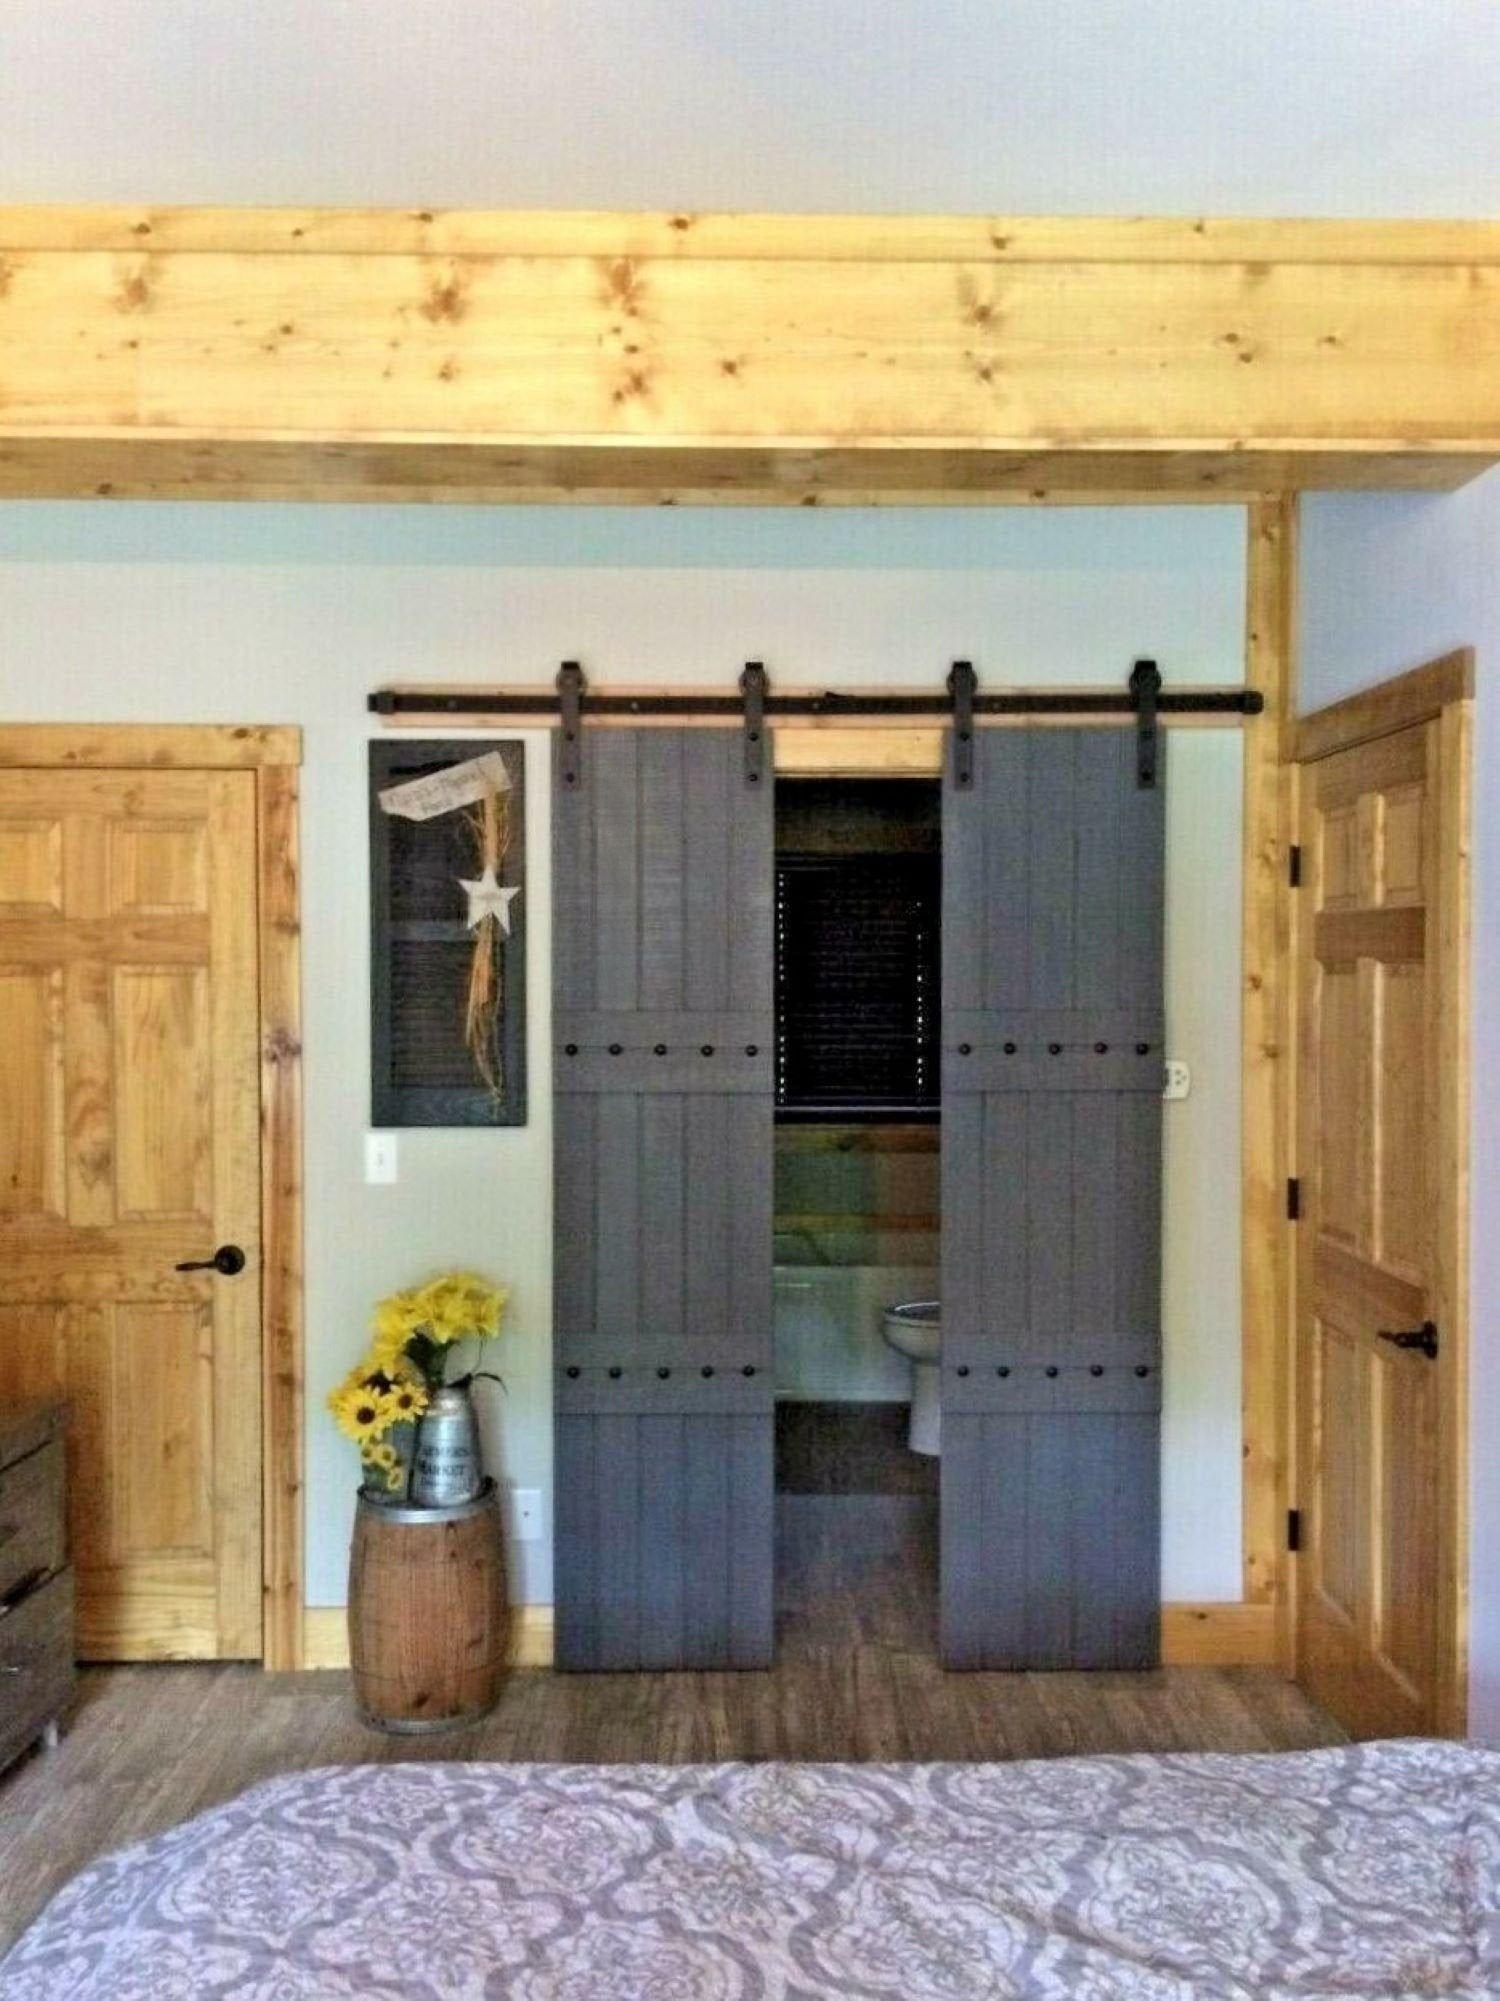 Gray Double Barndoors Hardware 6 6ft Sliding Barn Door Track Kit W 4 Rollers Wood Inter Double Barn Doors Interior Barn Doors